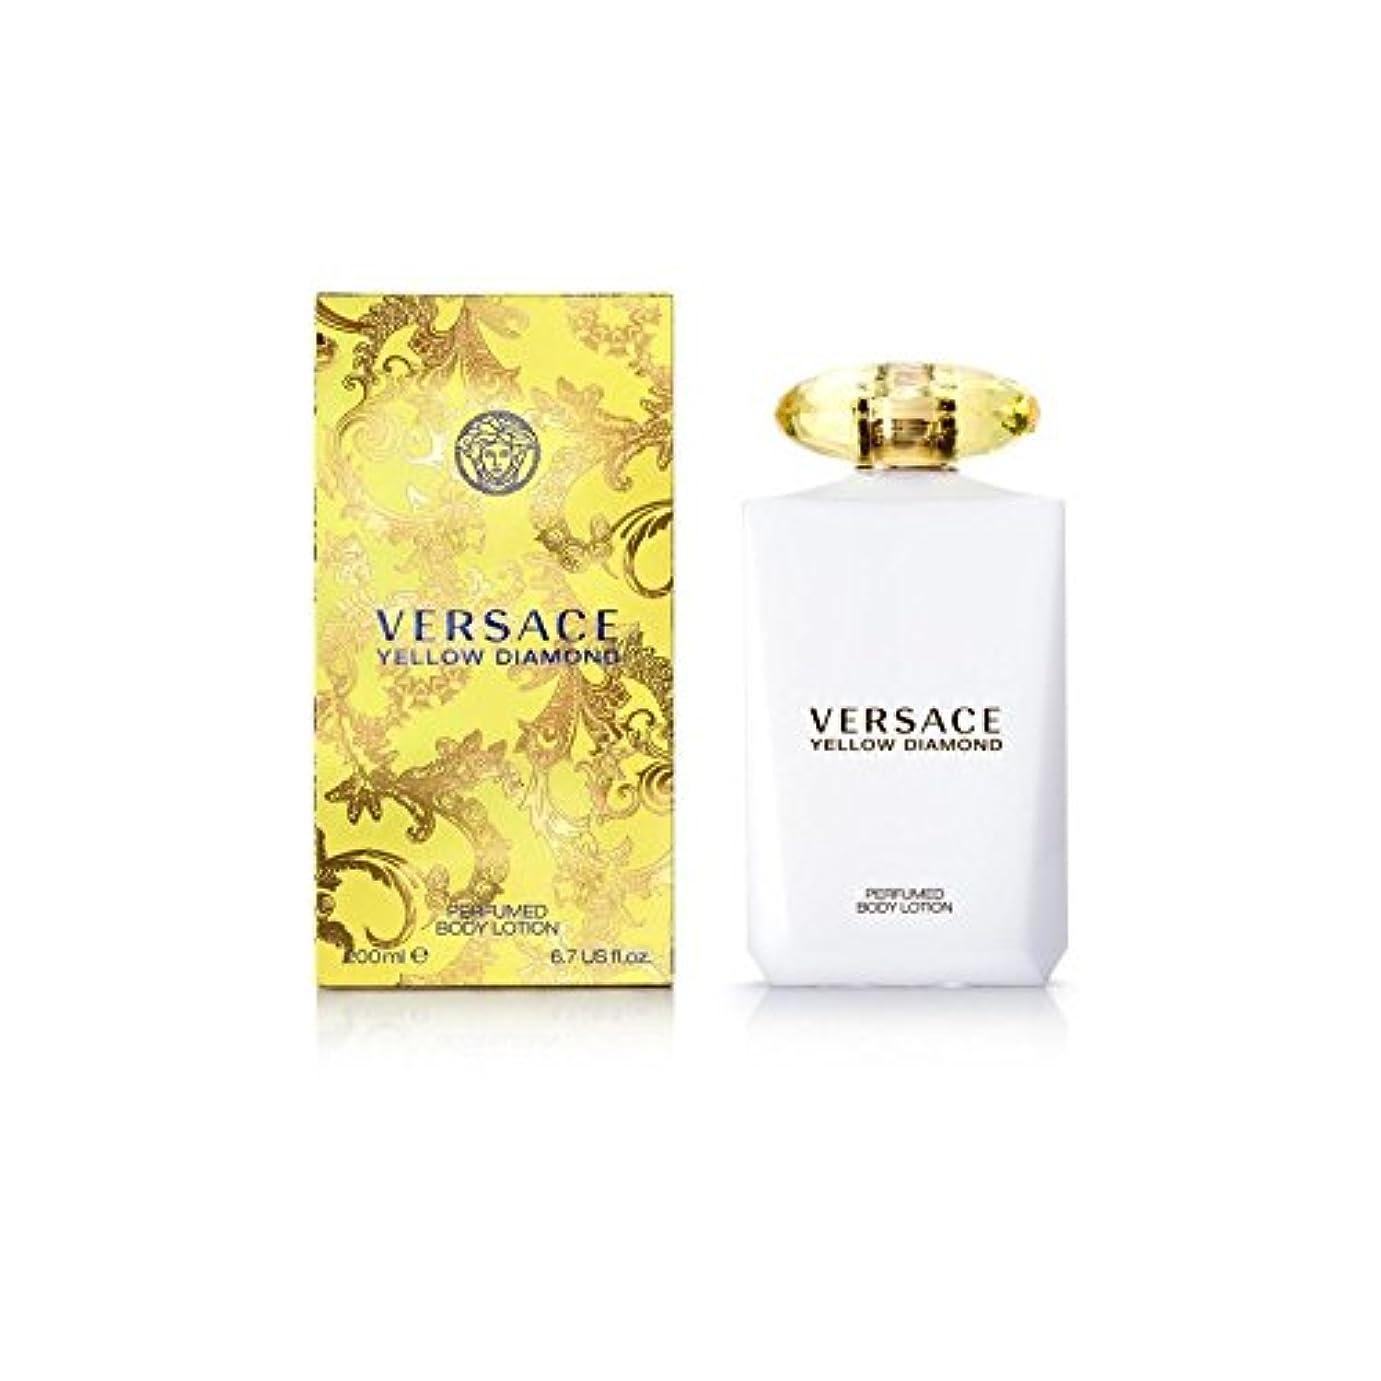 Versace Yellow Diamond Body Lotion 200ml - ヴェルサーチ黄色のダイヤモンドボディローション200 [並行輸入品]